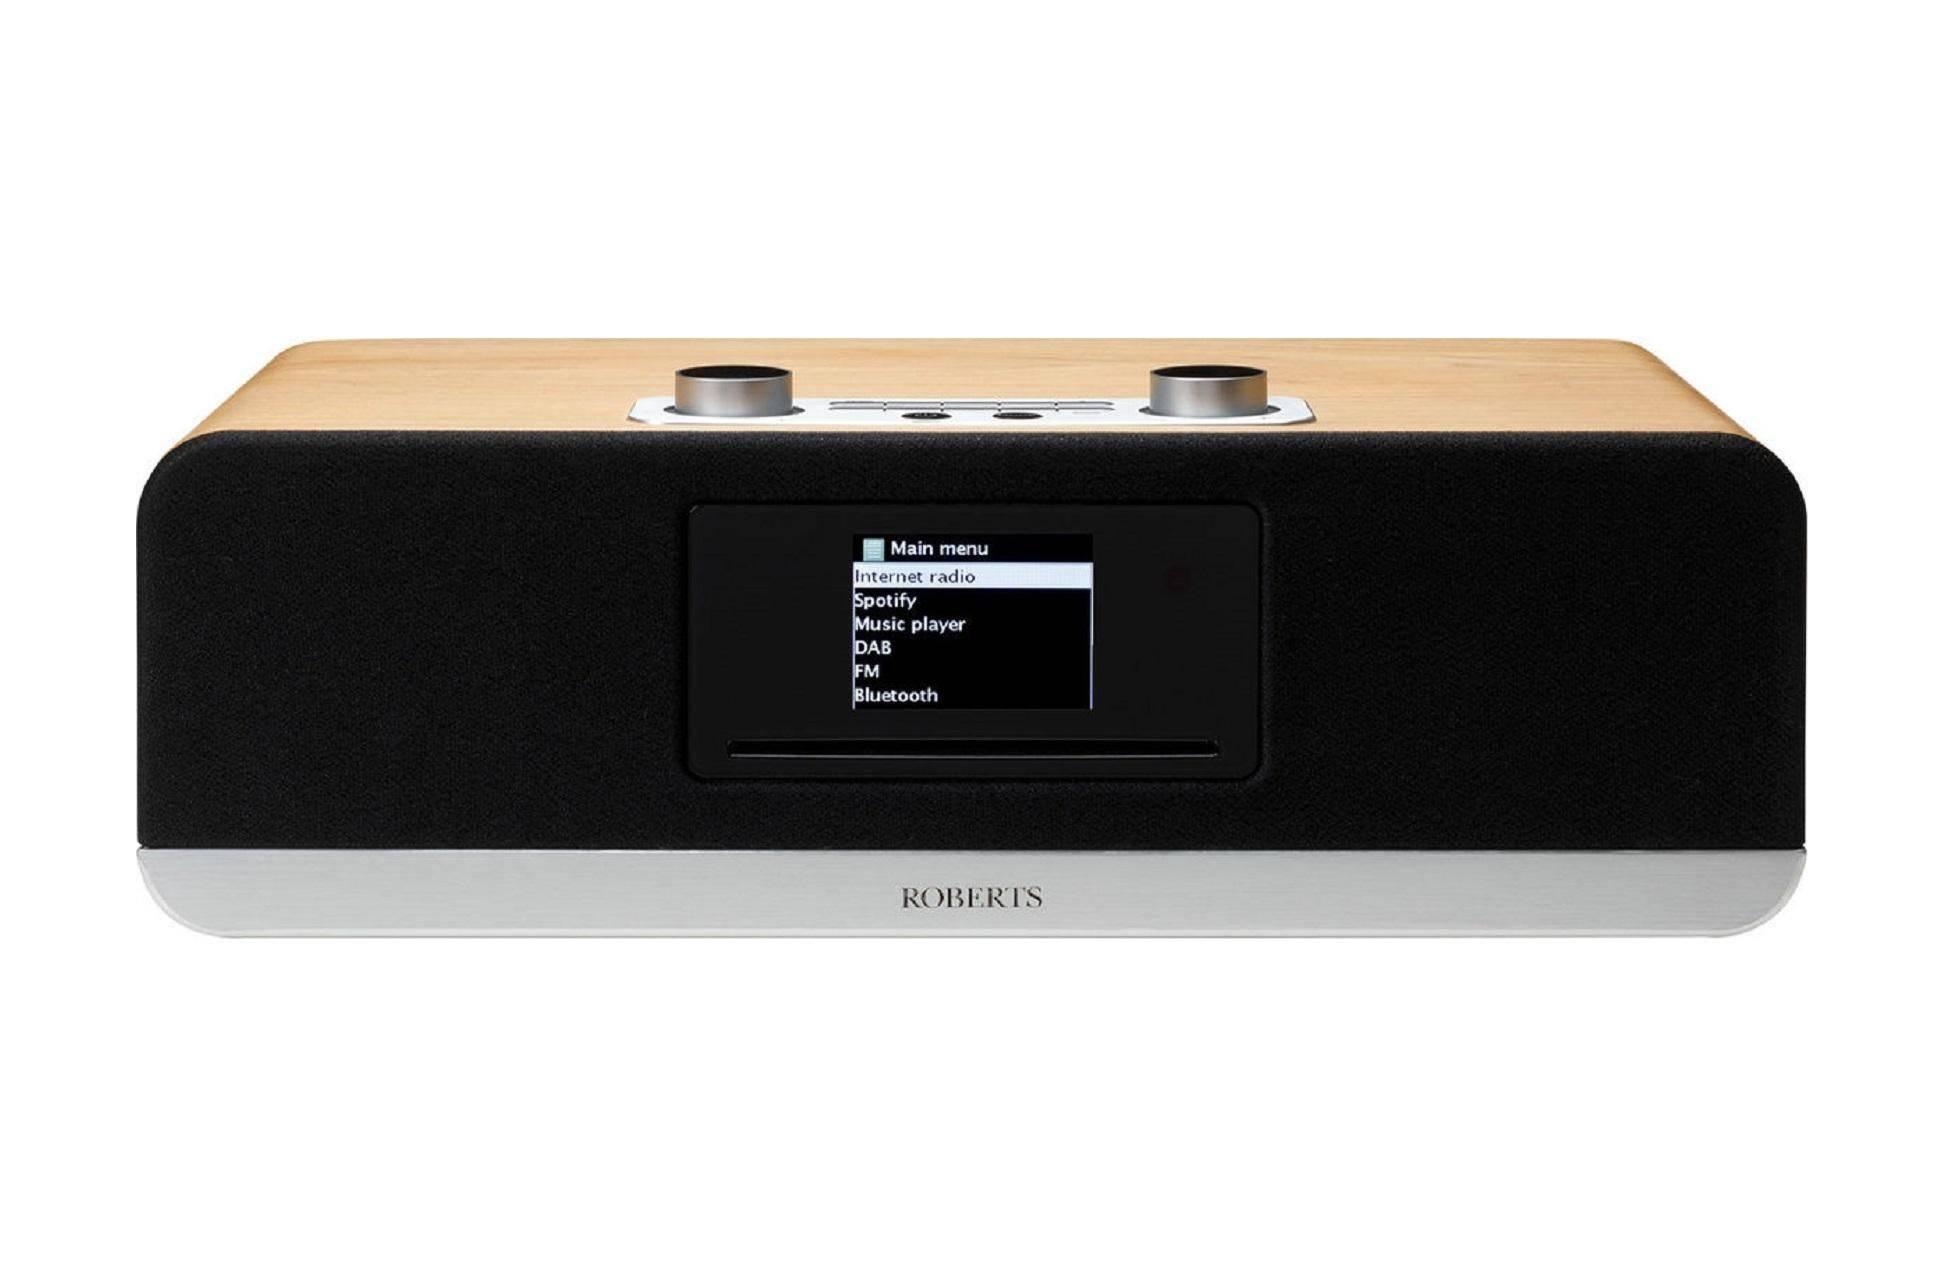 Roberts Radio Stream 67 Smart Audio System - Oak